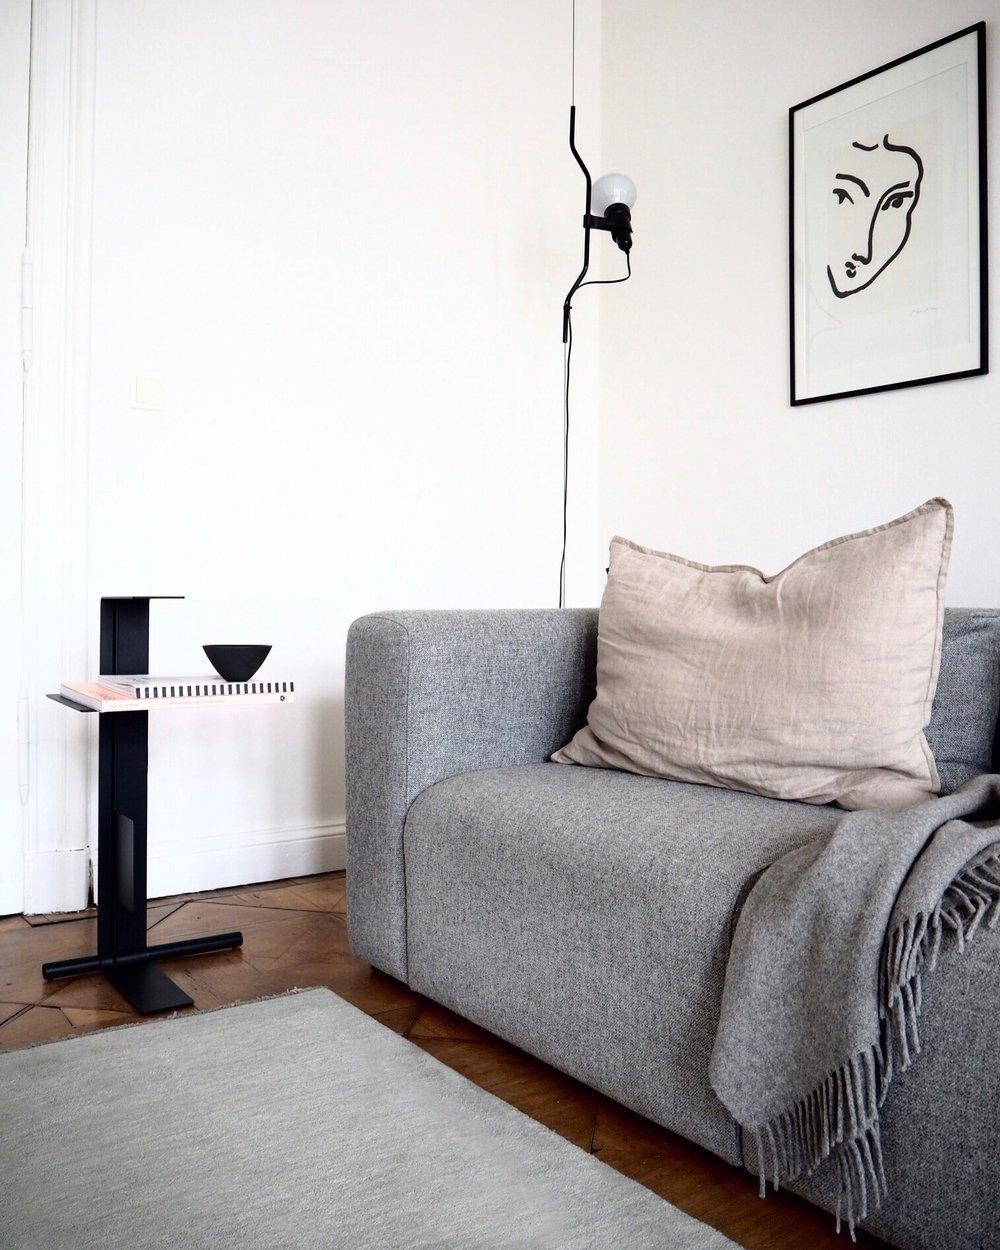 Selina Lauck - Home Tour - minimal interior